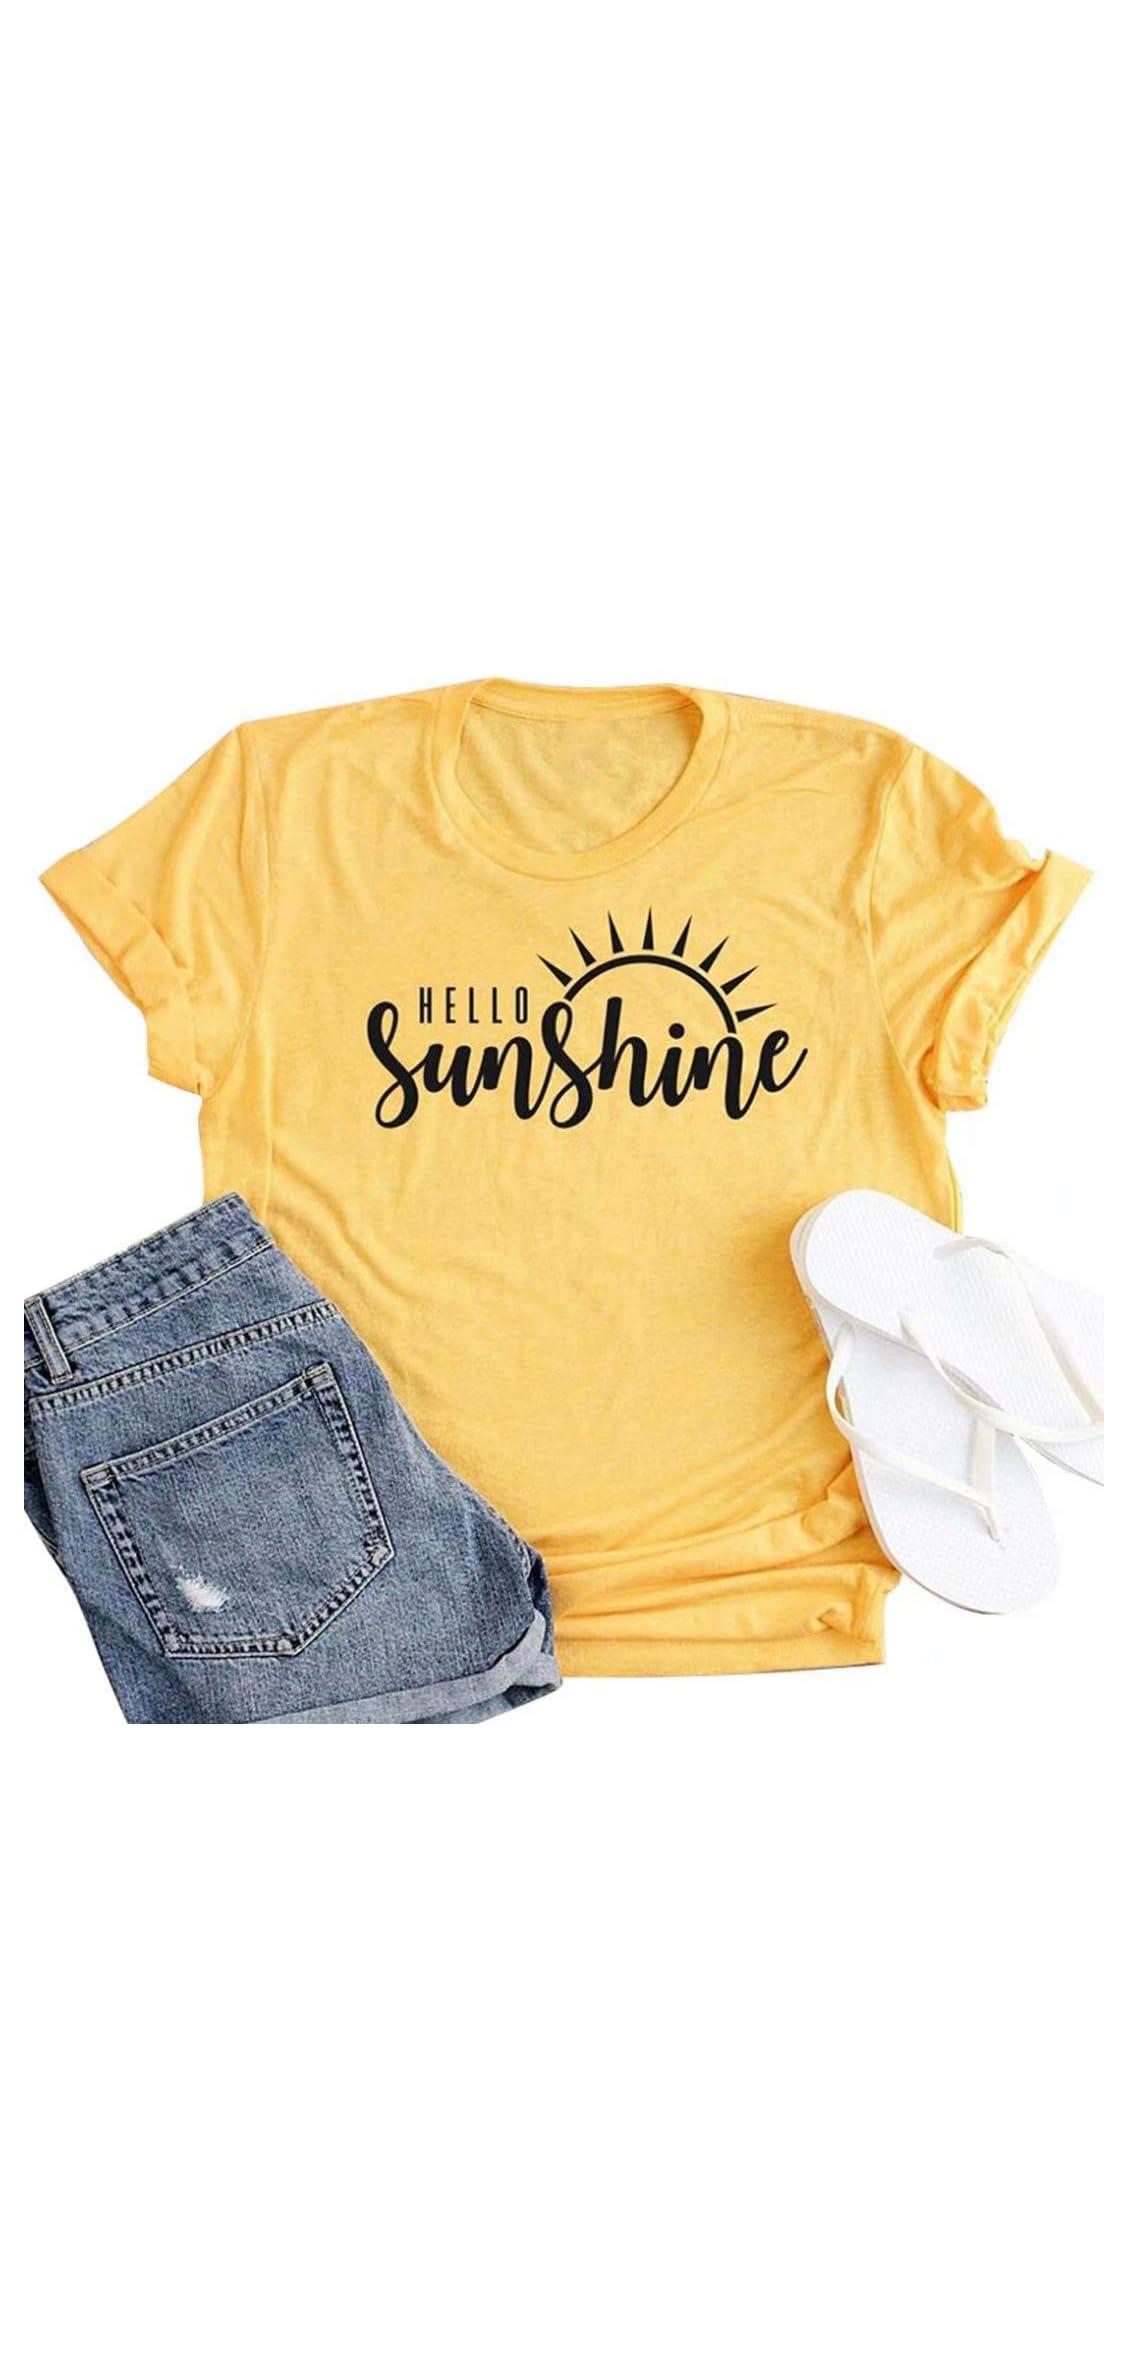 Hello Sunshine Shirt Top Women Summer Short Sleeve Graphic Print